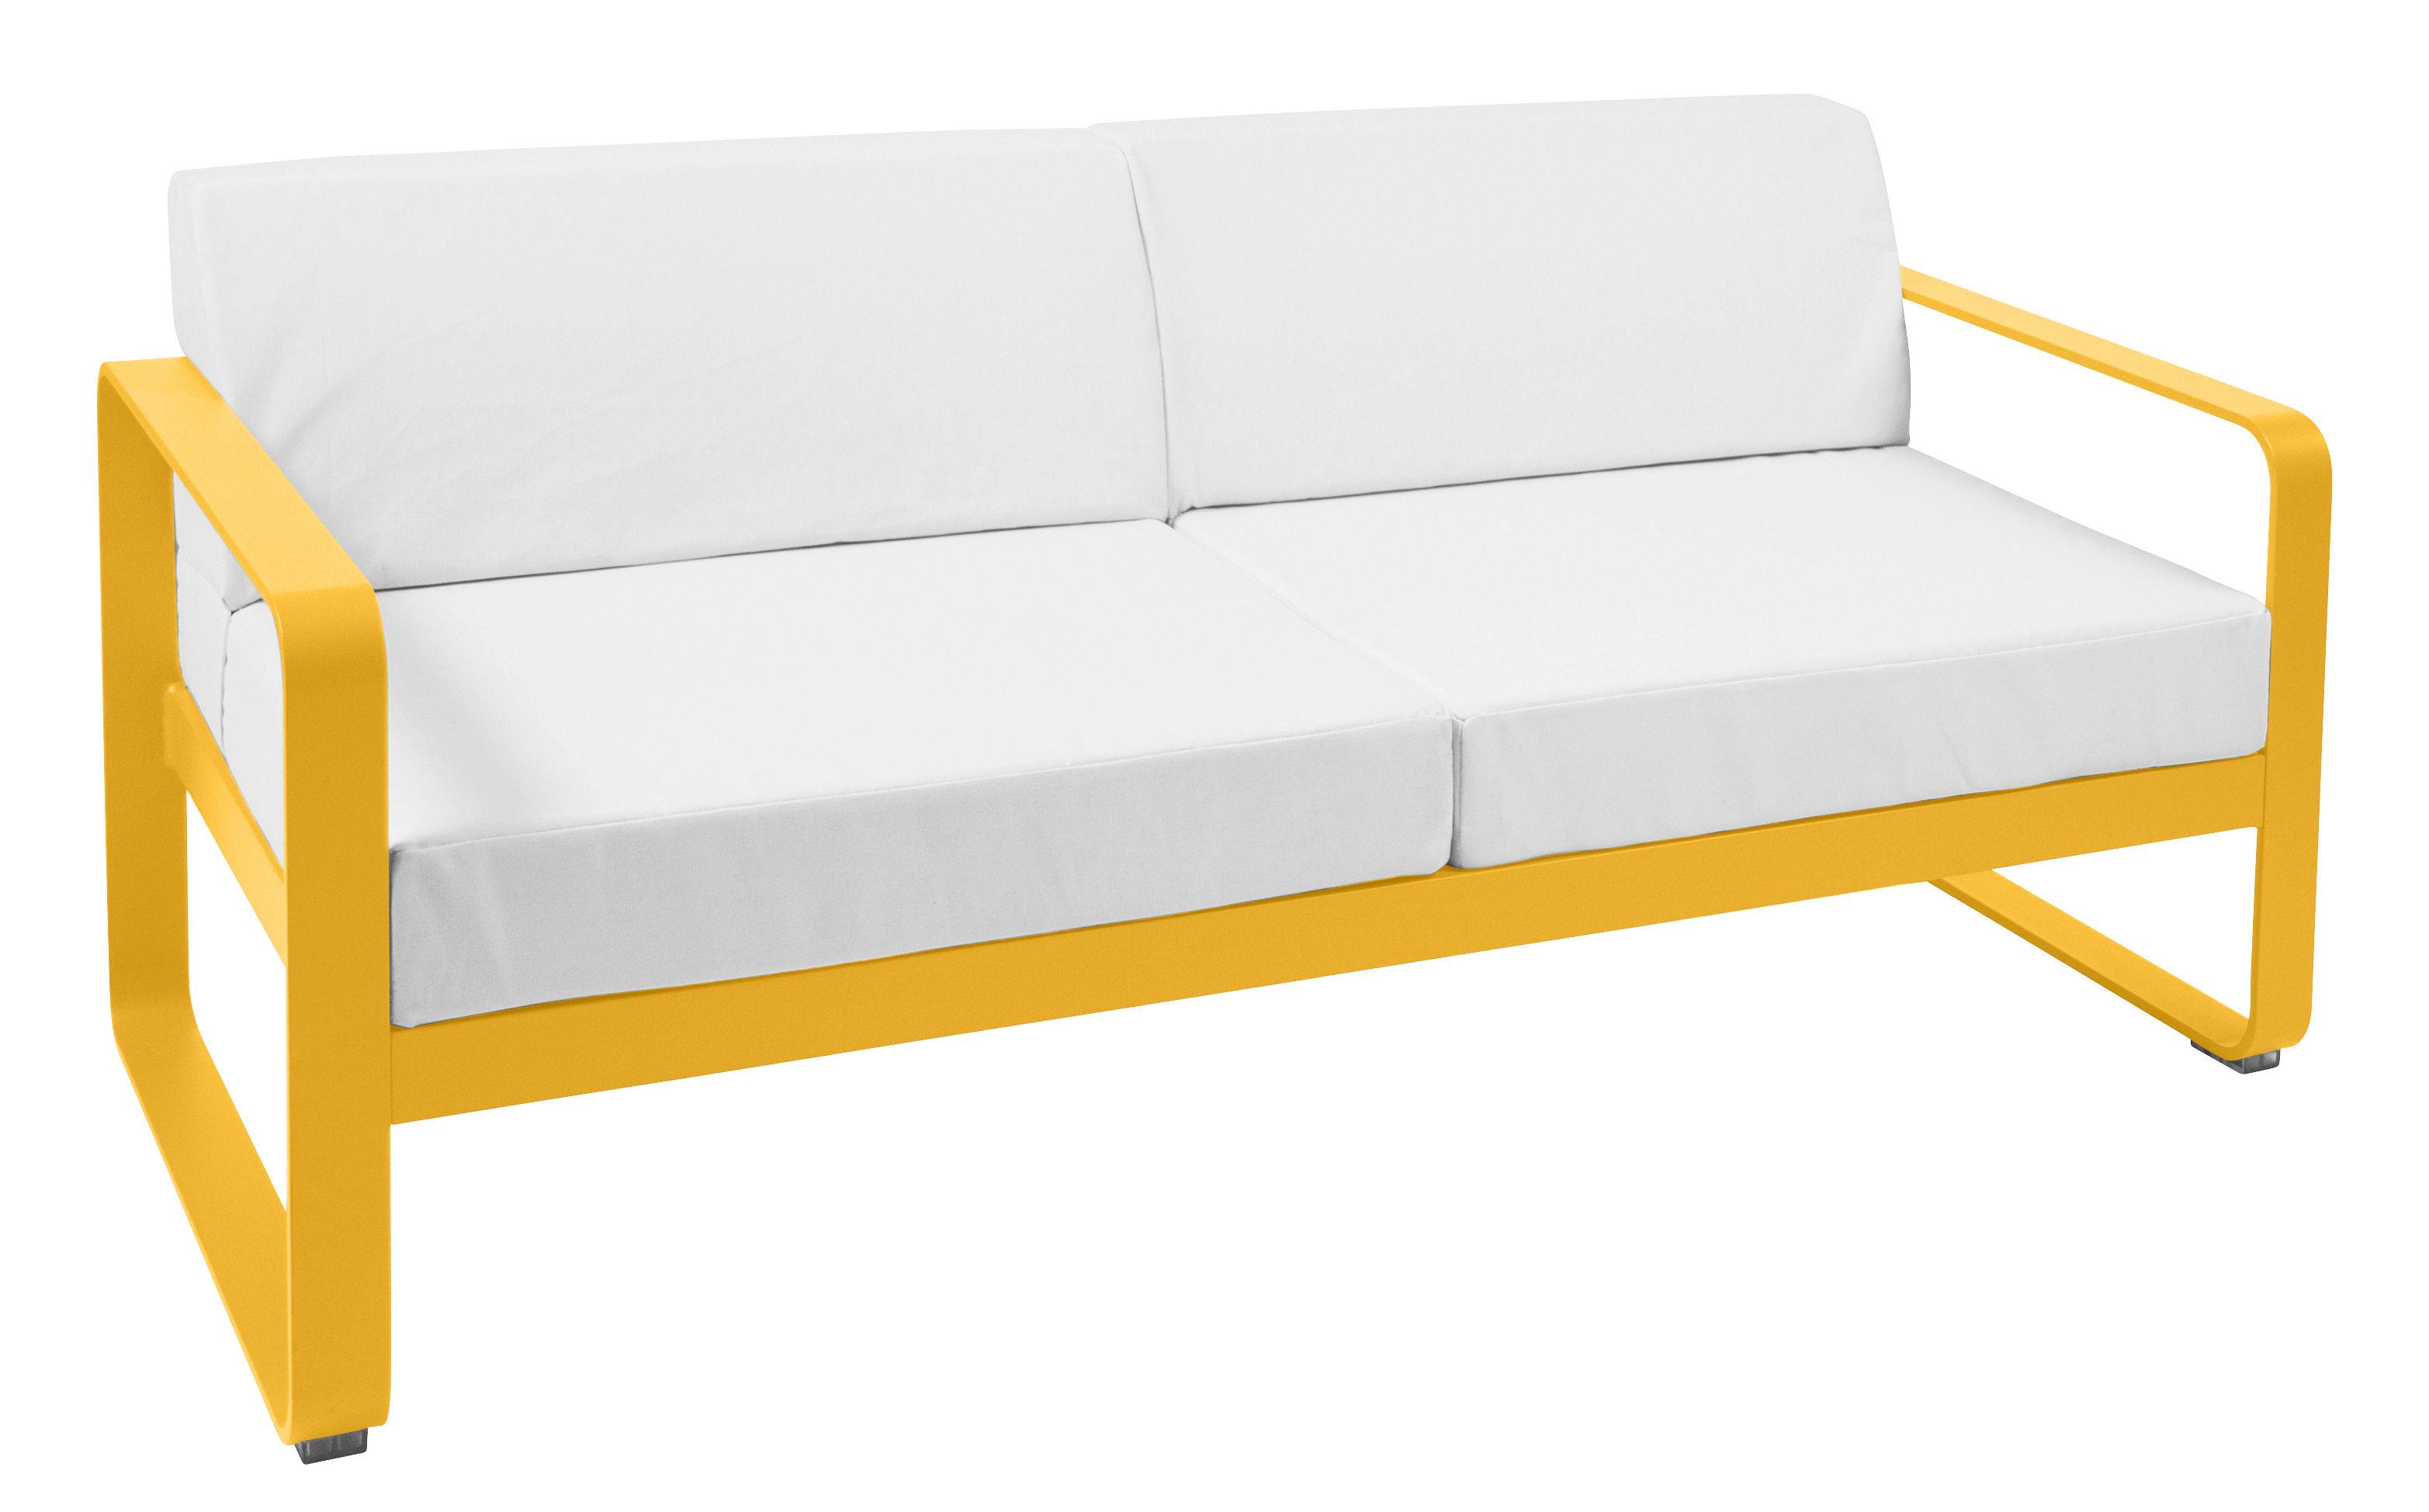 canap droit bellevie 2 places l 160 cm tissu blanc miel tissu blanc fermob. Black Bedroom Furniture Sets. Home Design Ideas